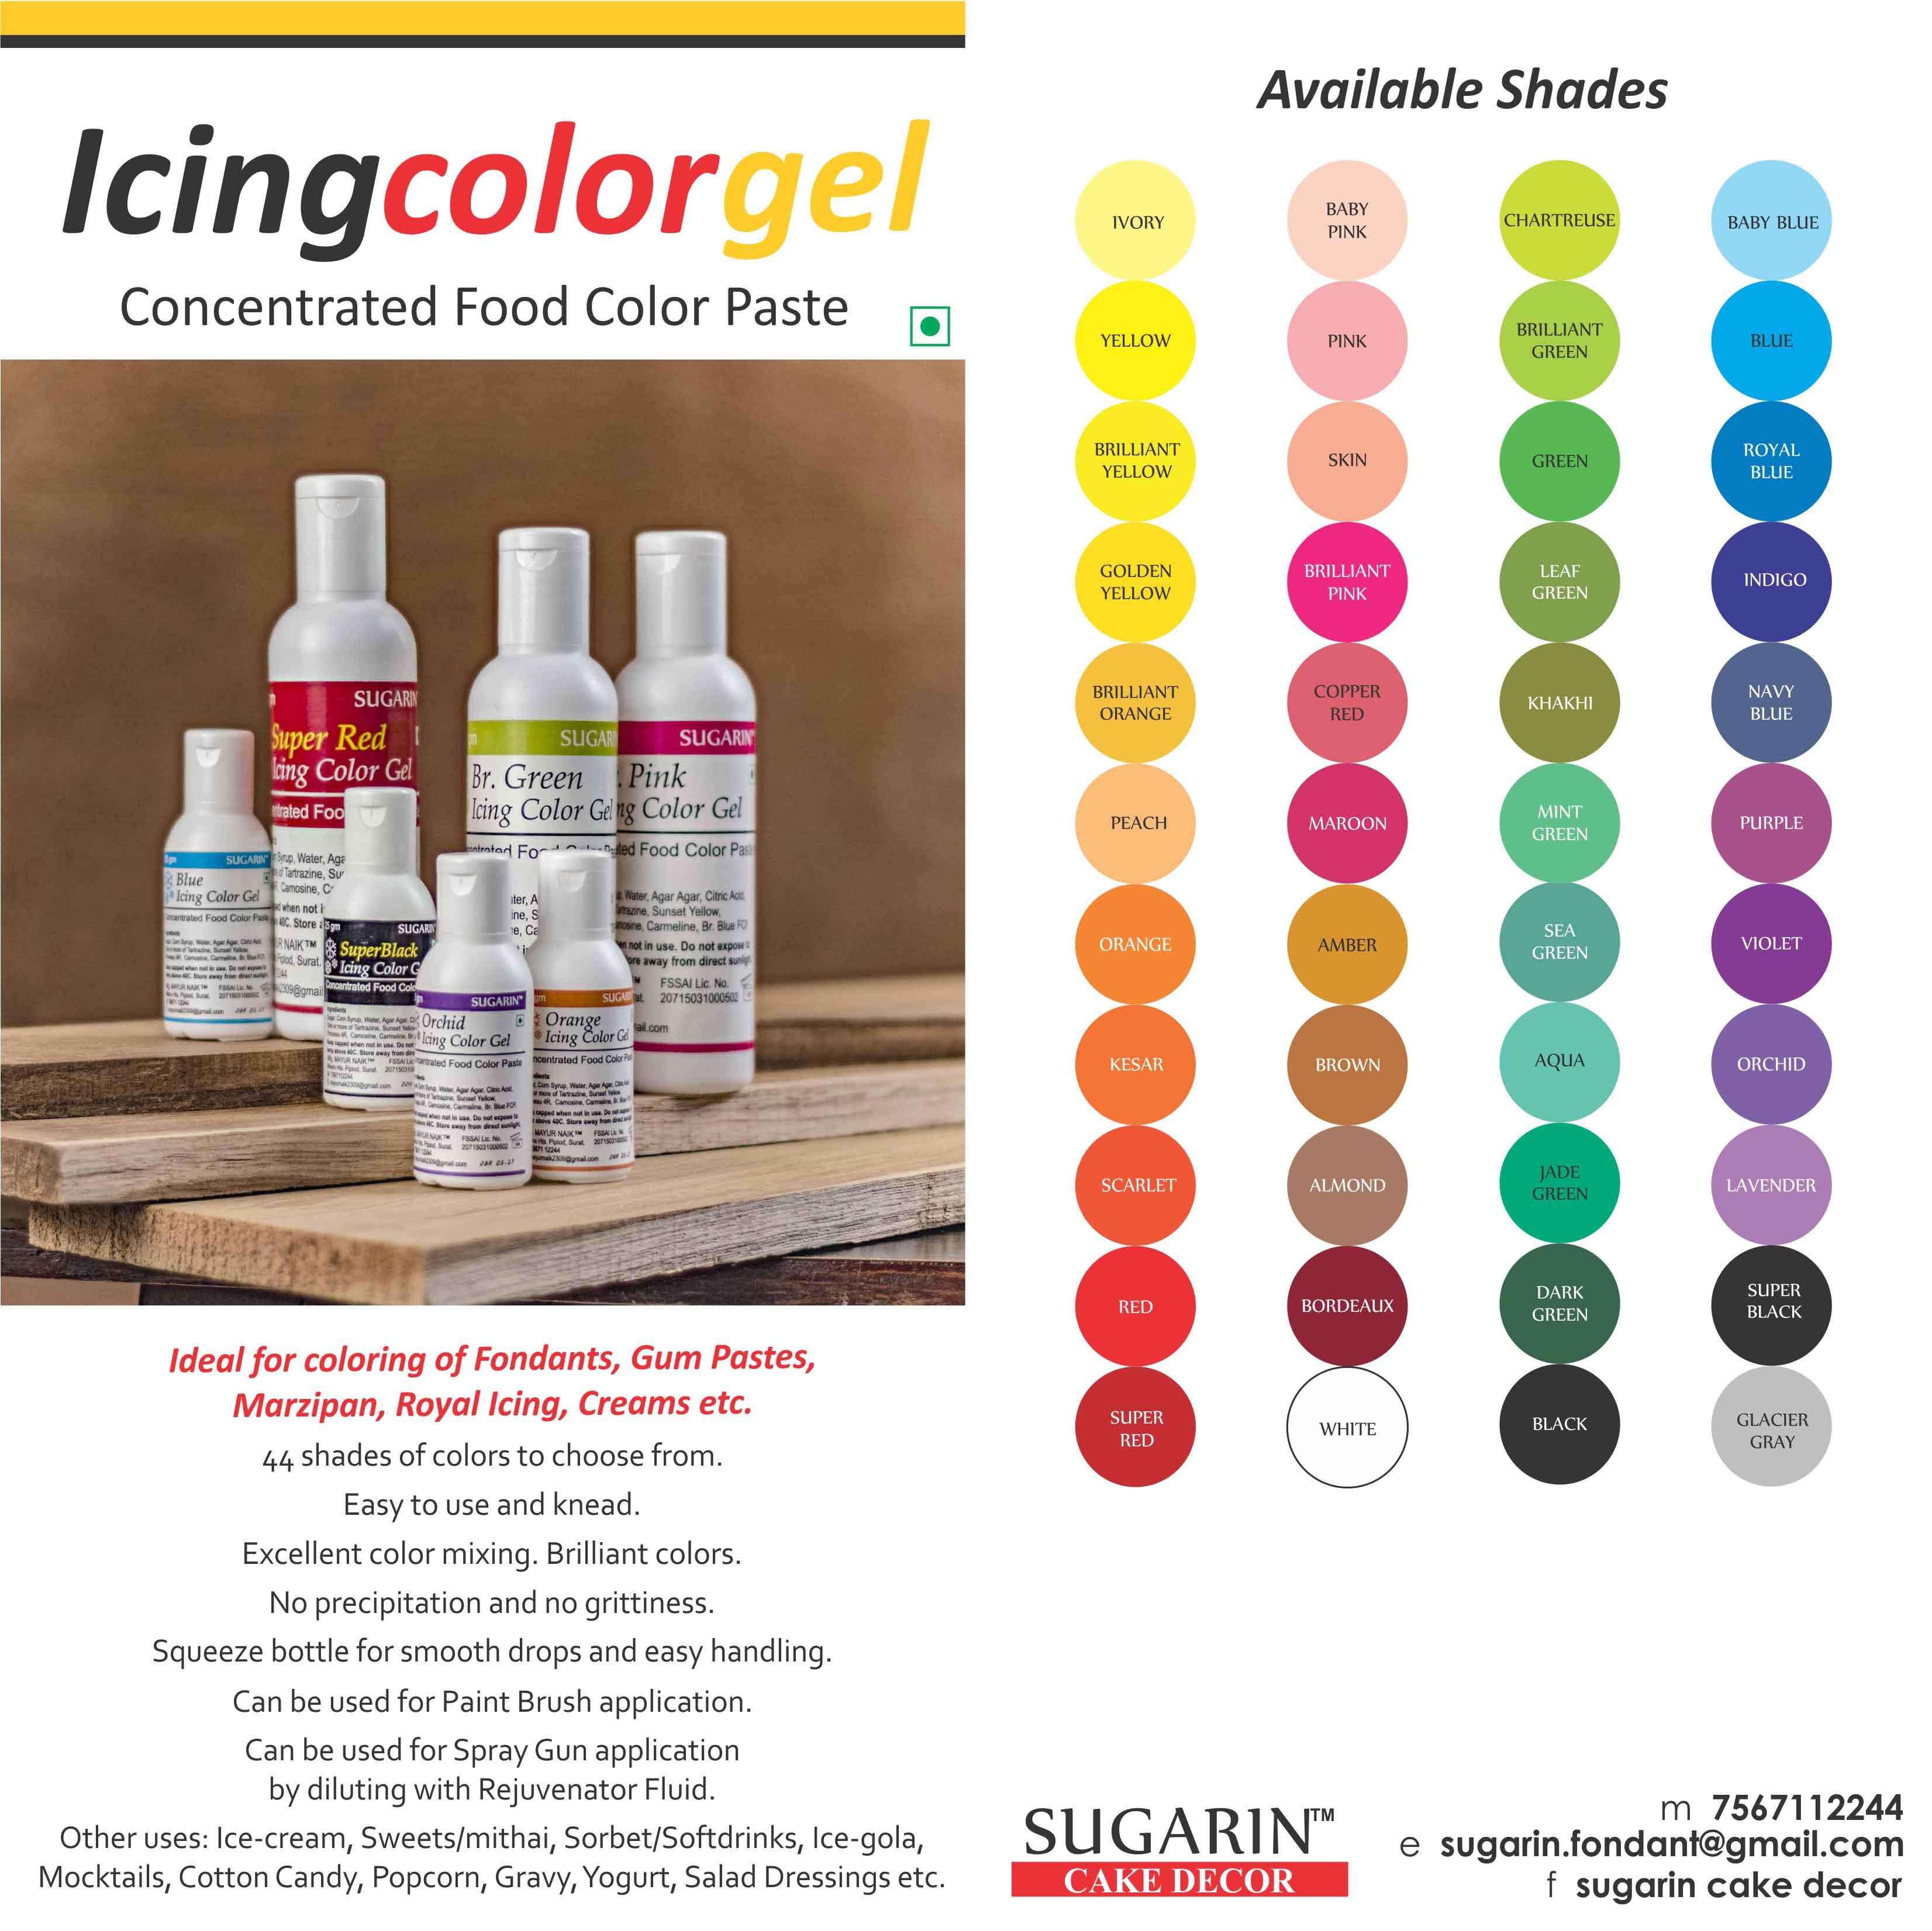 Icing Color Gel